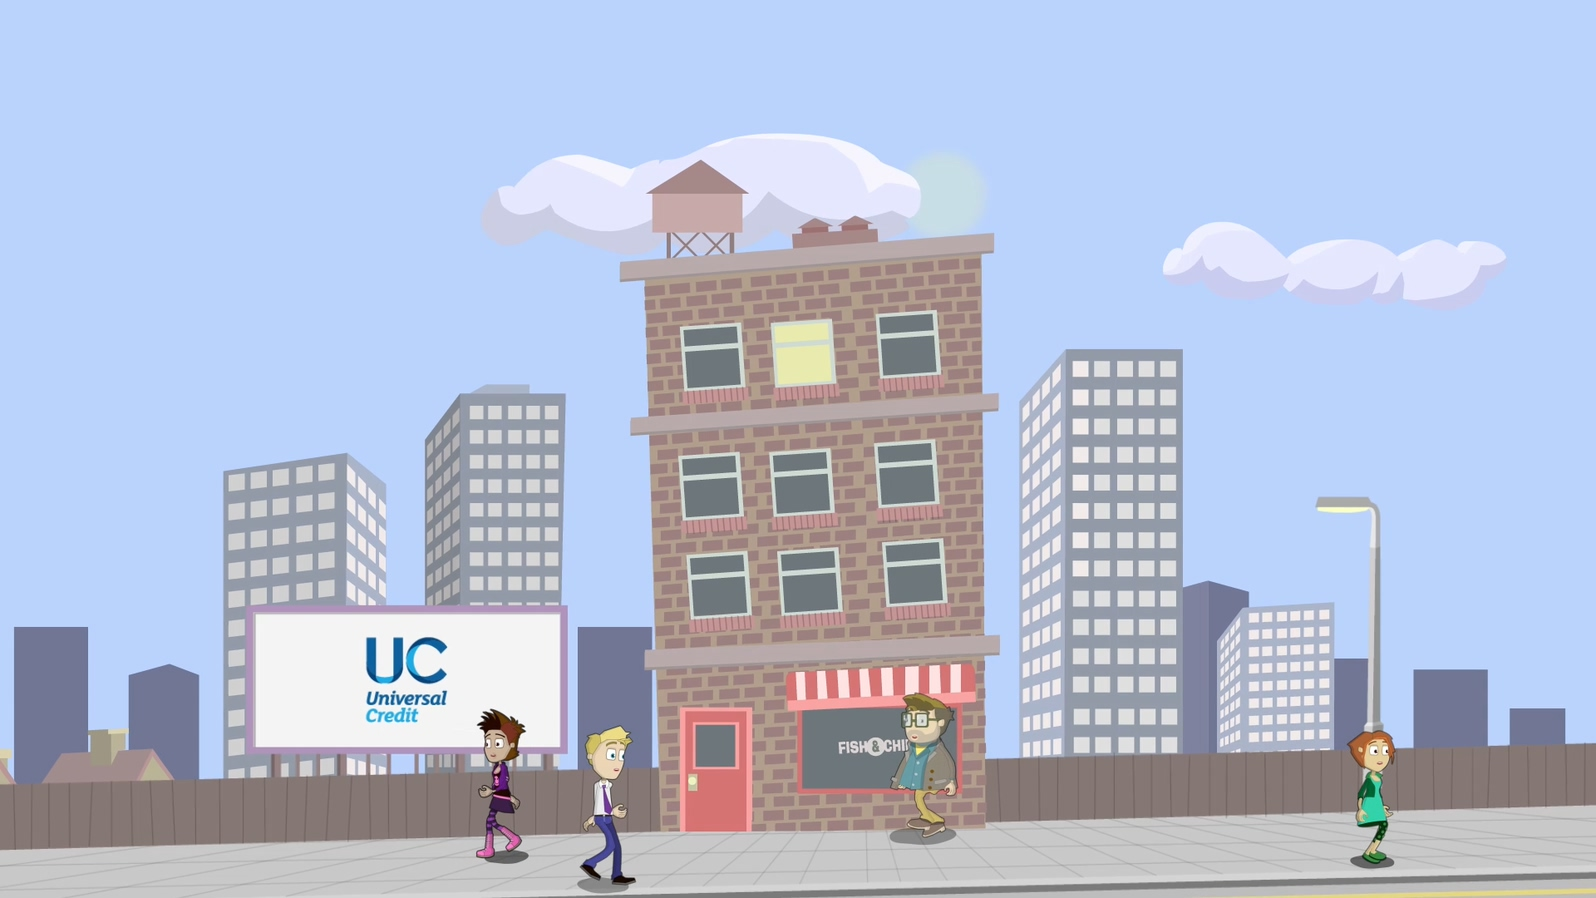 'Universal Credit' Animation